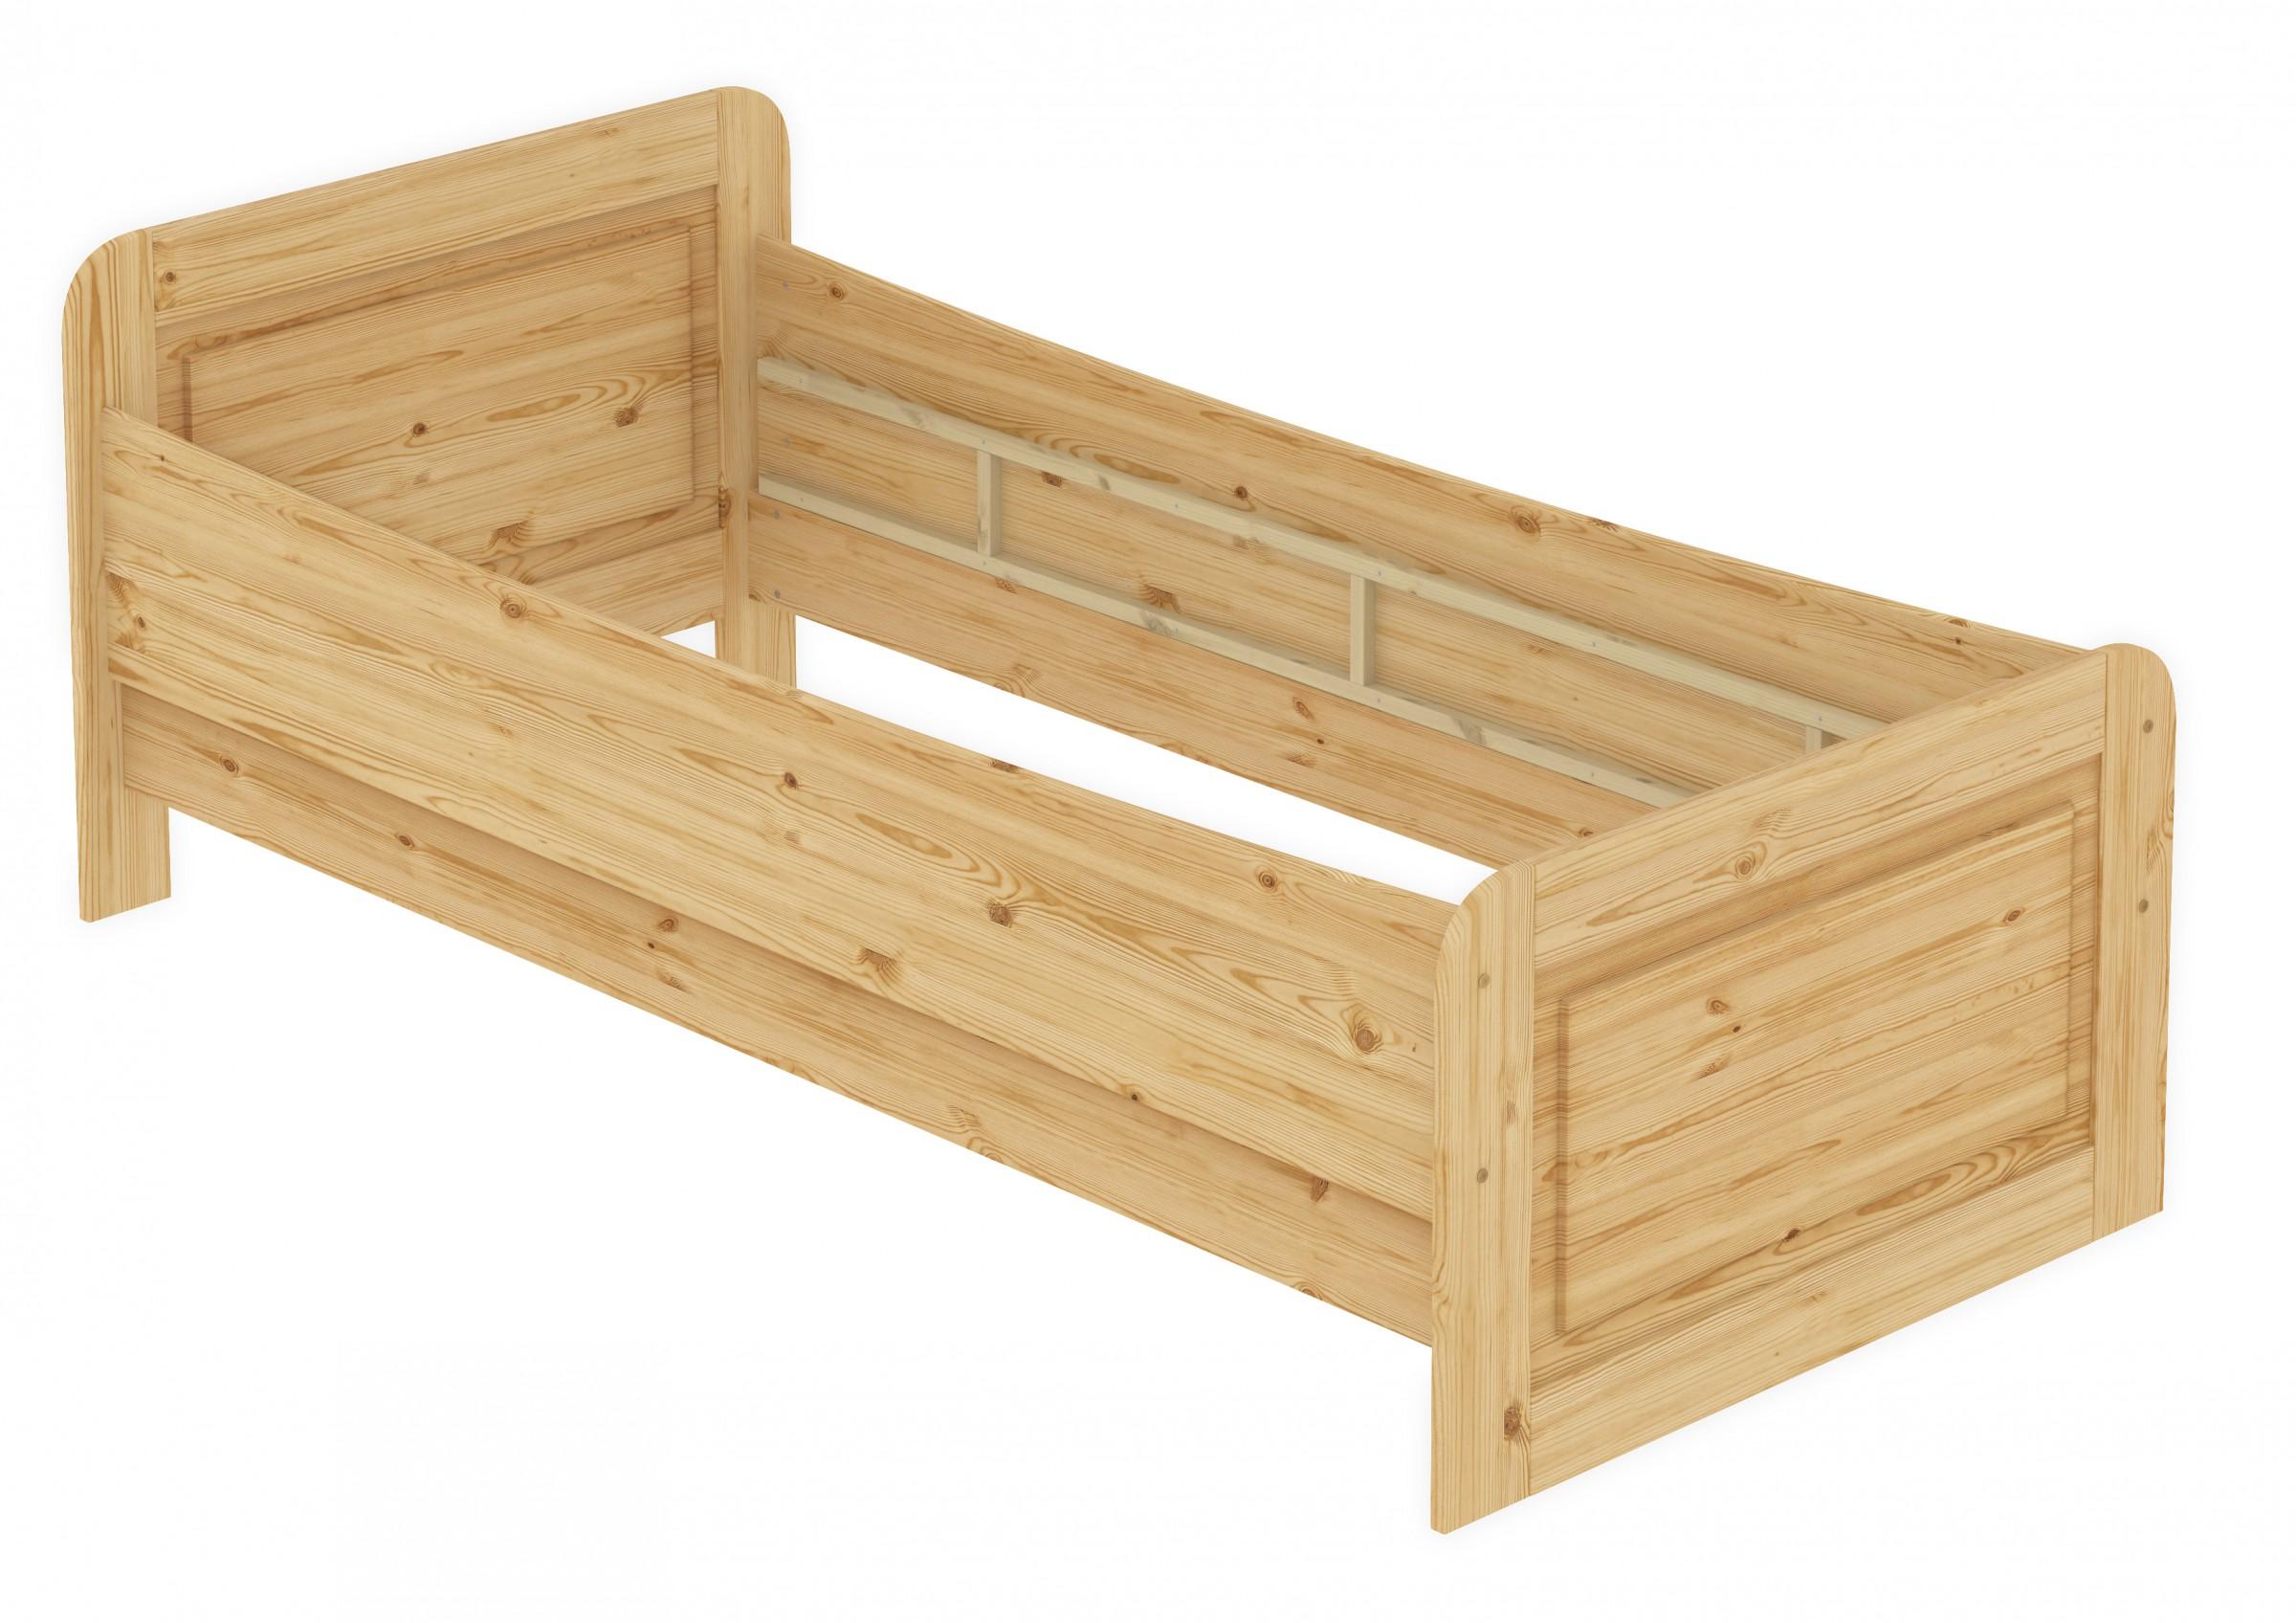 seniorenbett extra hoch 120x200 einzelbett holzbett g stebett massivholz kiefer bett or. Black Bedroom Furniture Sets. Home Design Ideas